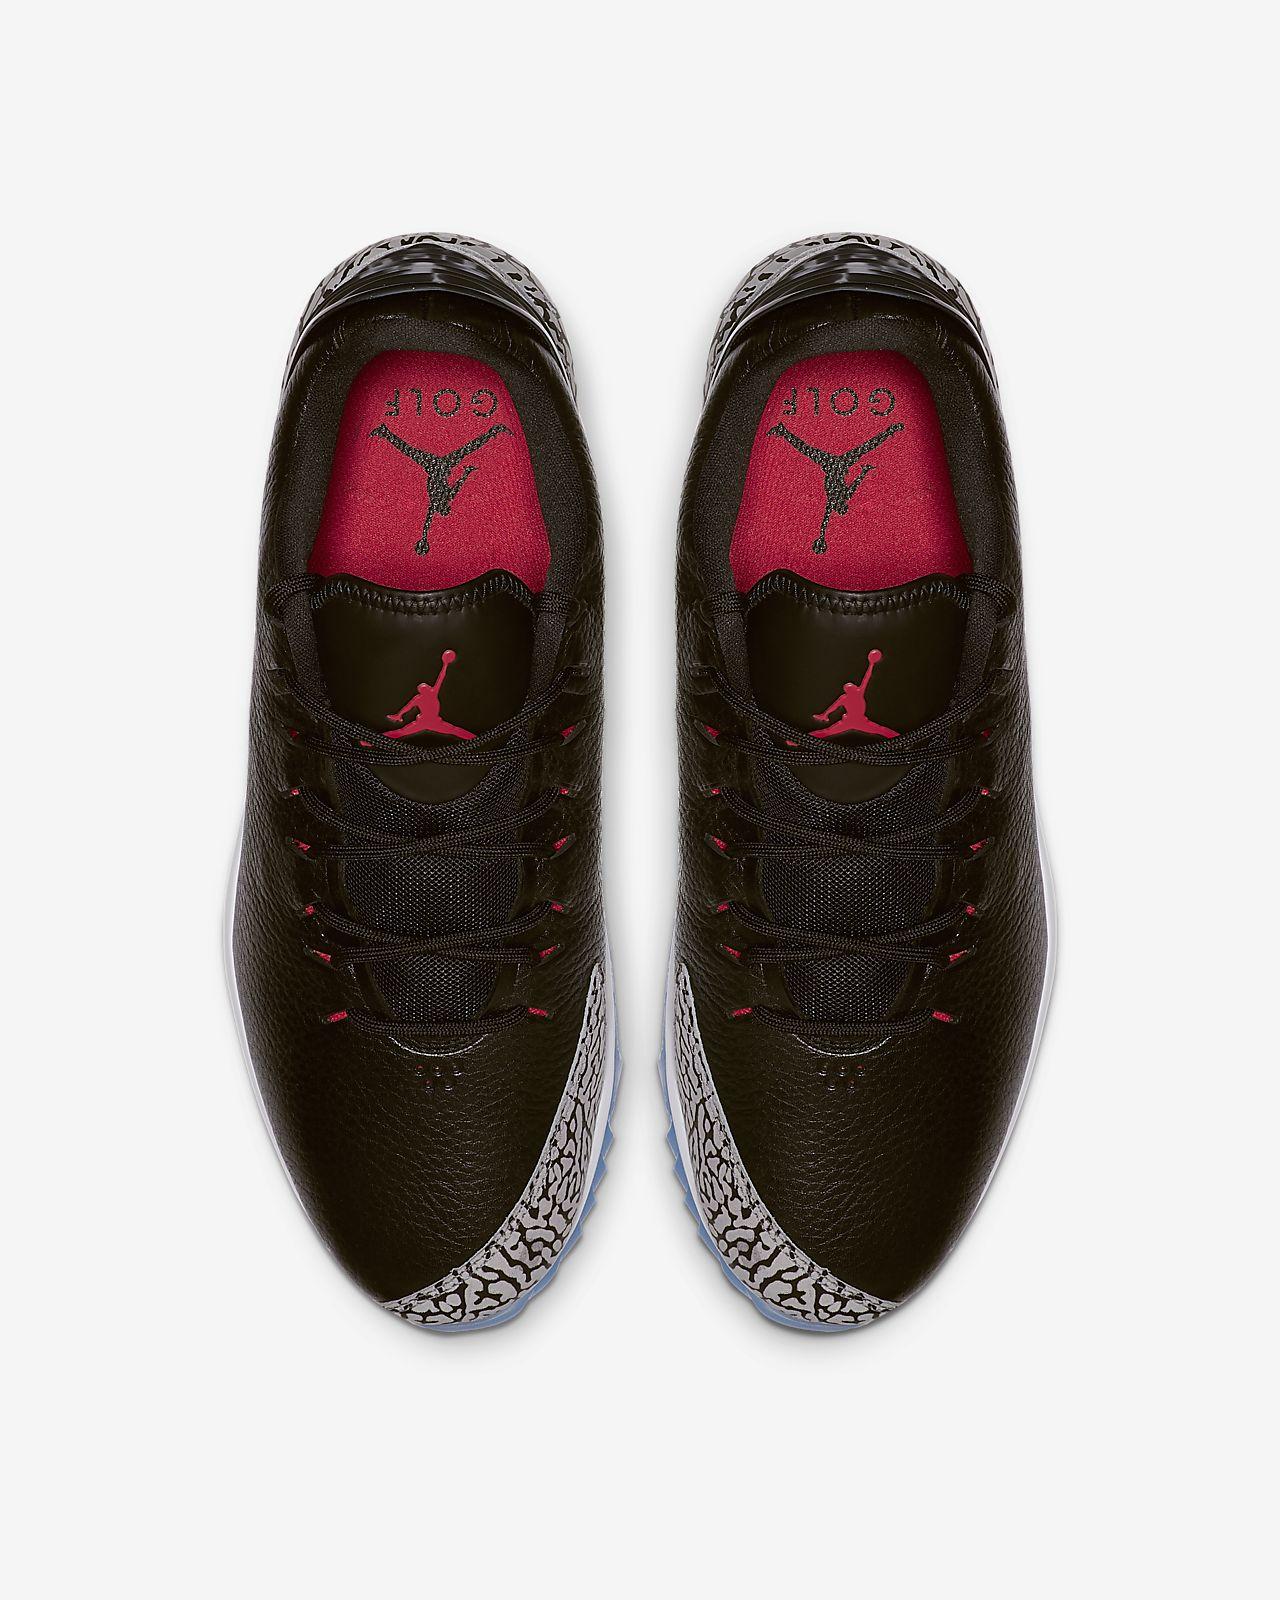 5066d058baa Jordan ADG Men s Golf Shoe. Nike.com GB